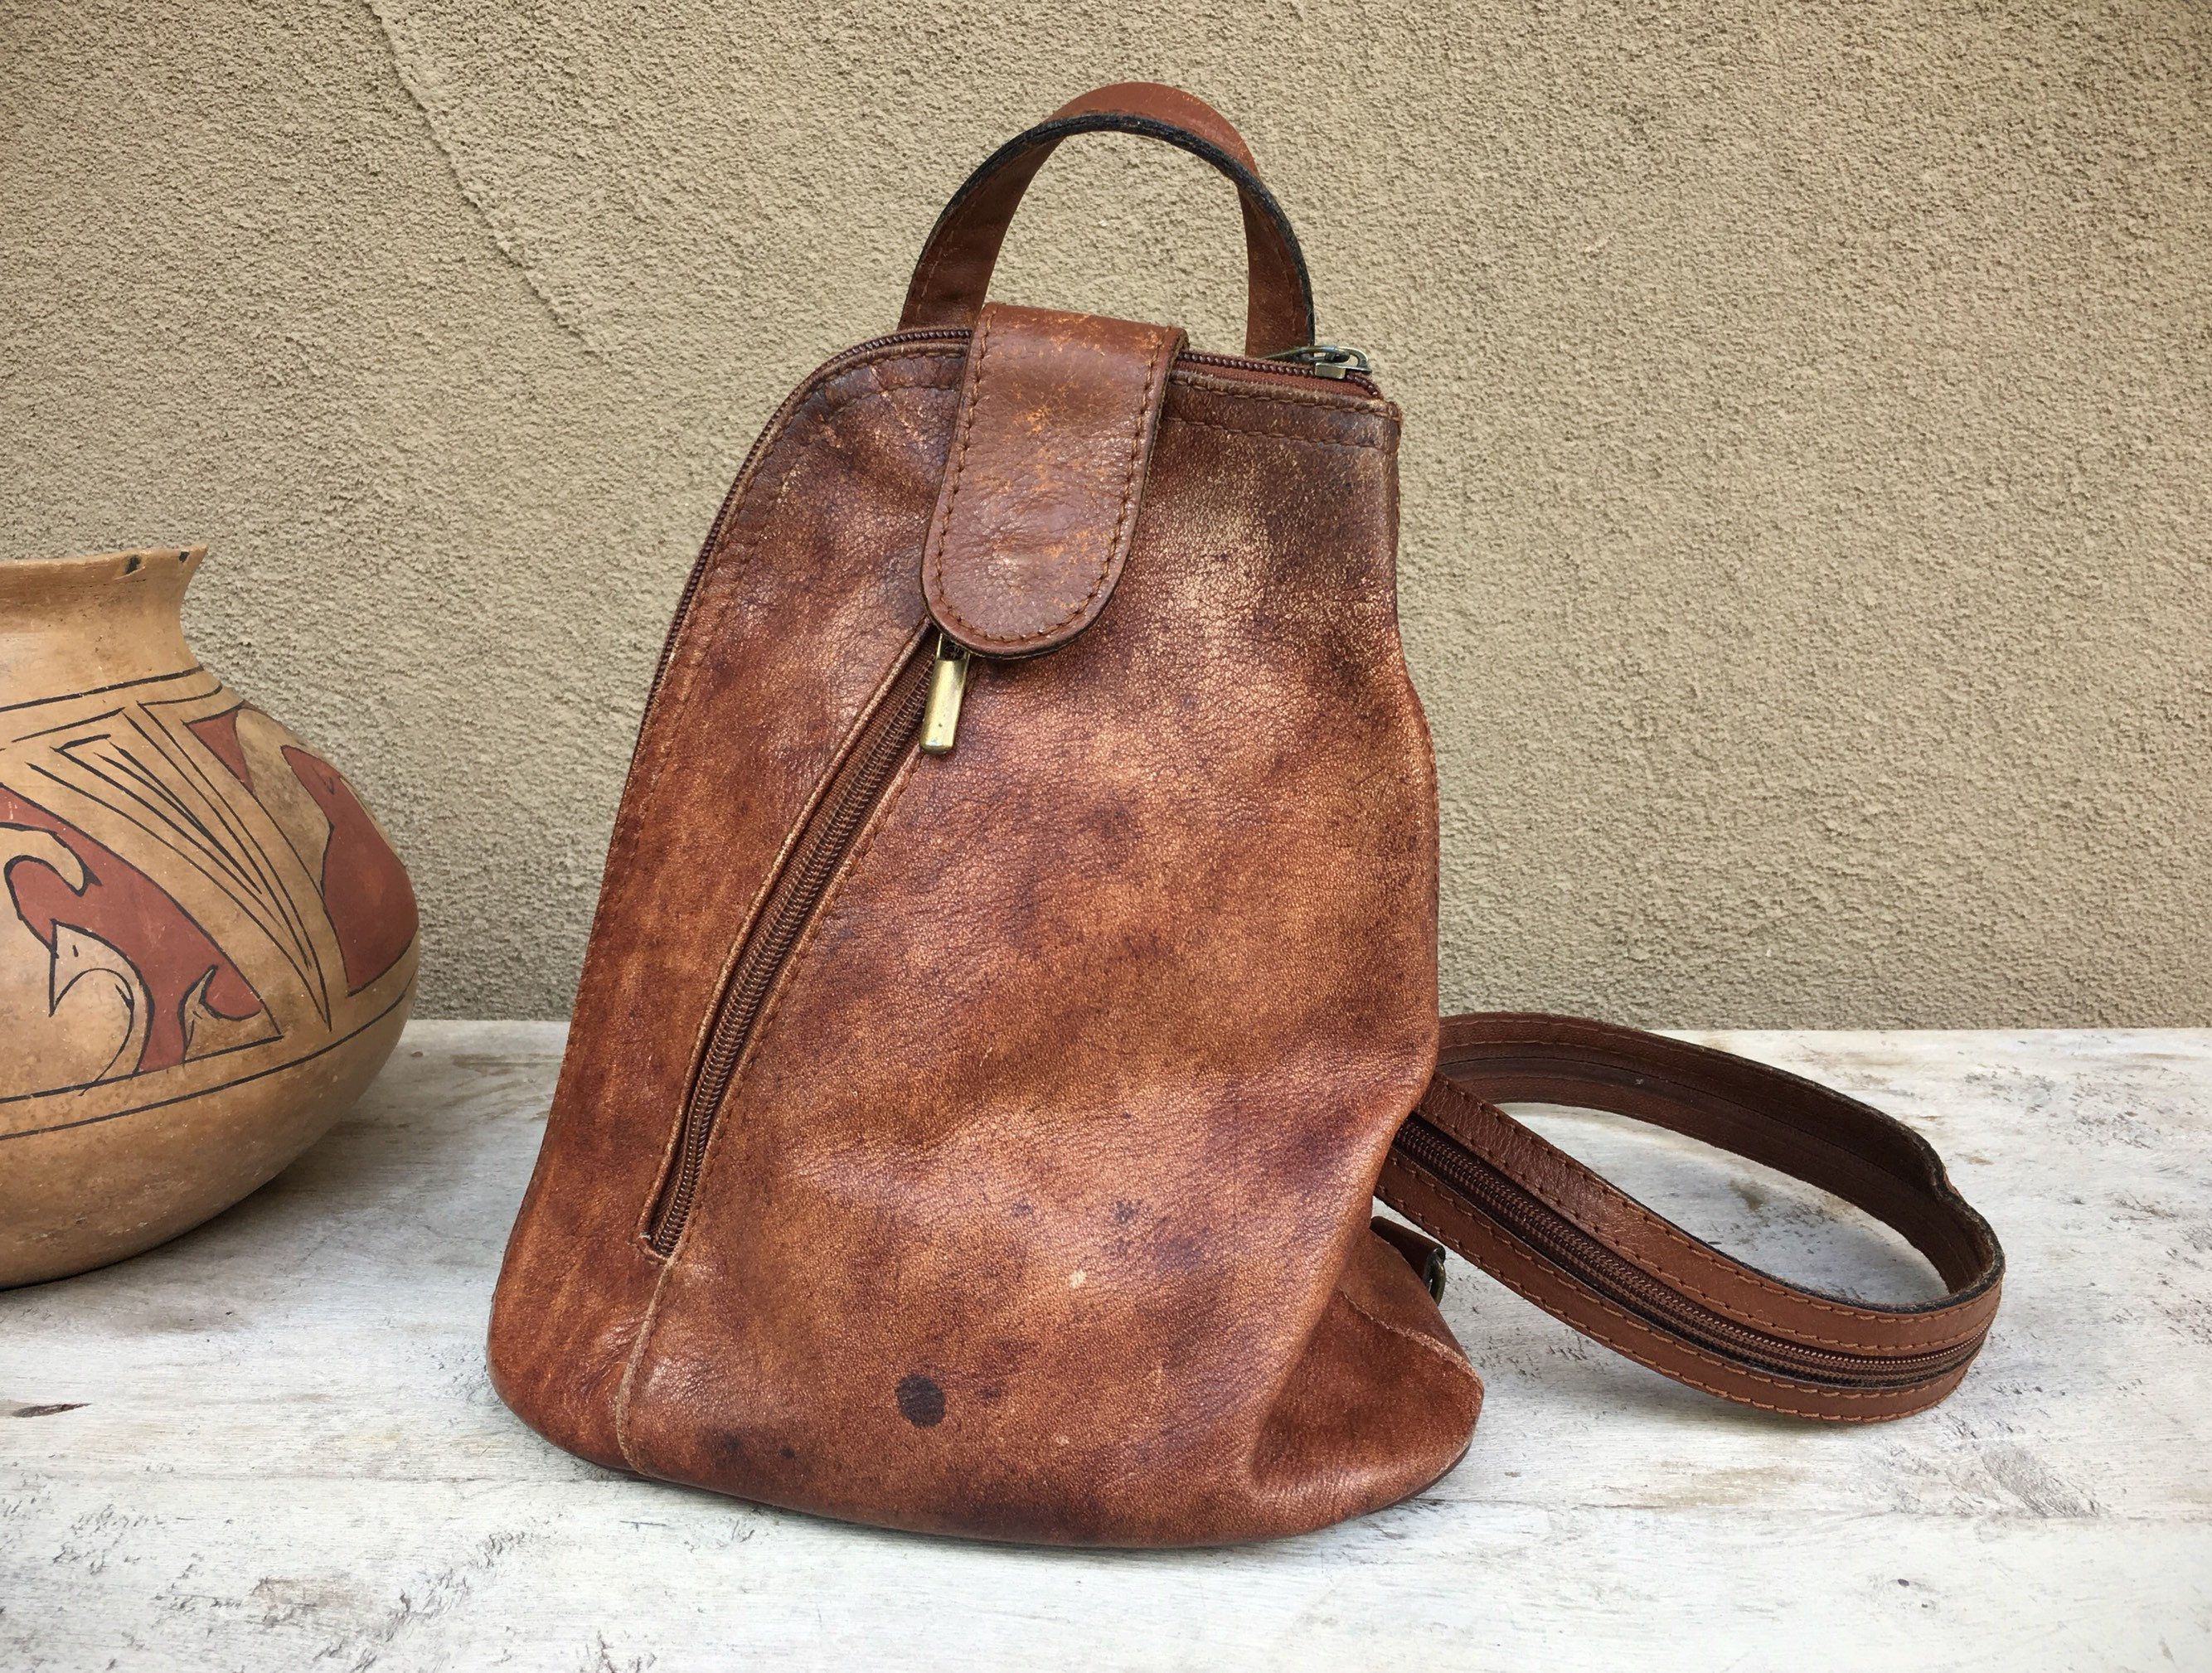 e38492871dd76 Vintage Small Sling Bag Chestnut Brown Italian Leather Single Strap  Backpack Purse for Women or Men